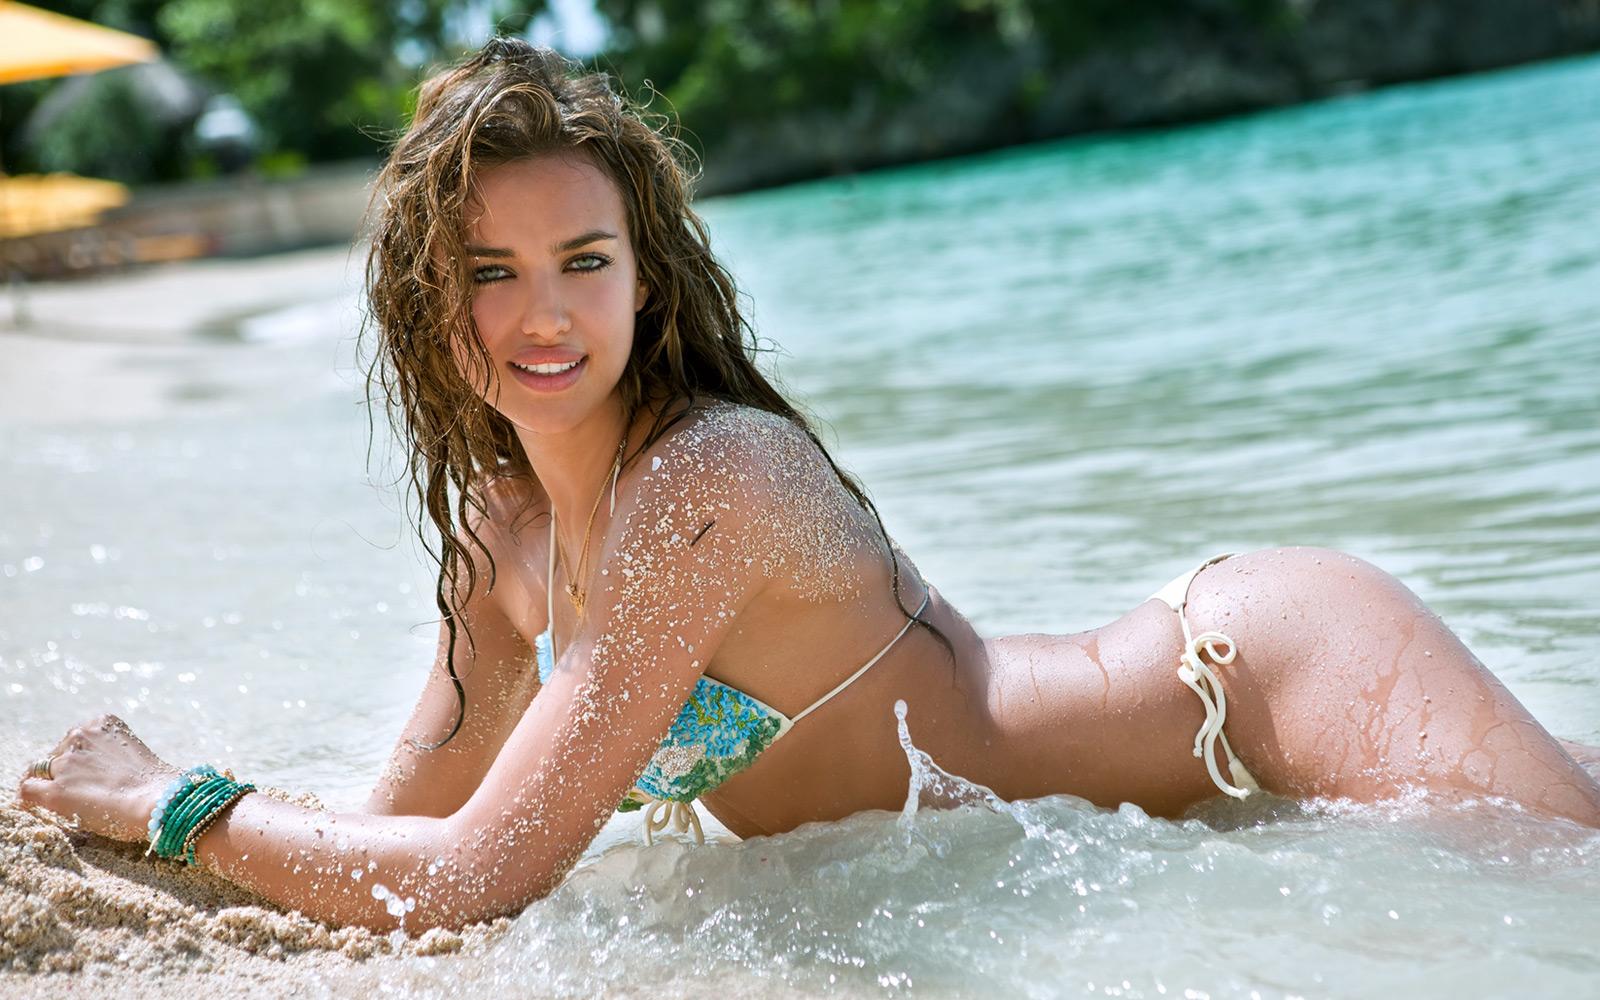 Sexy Irina Shayk Hot